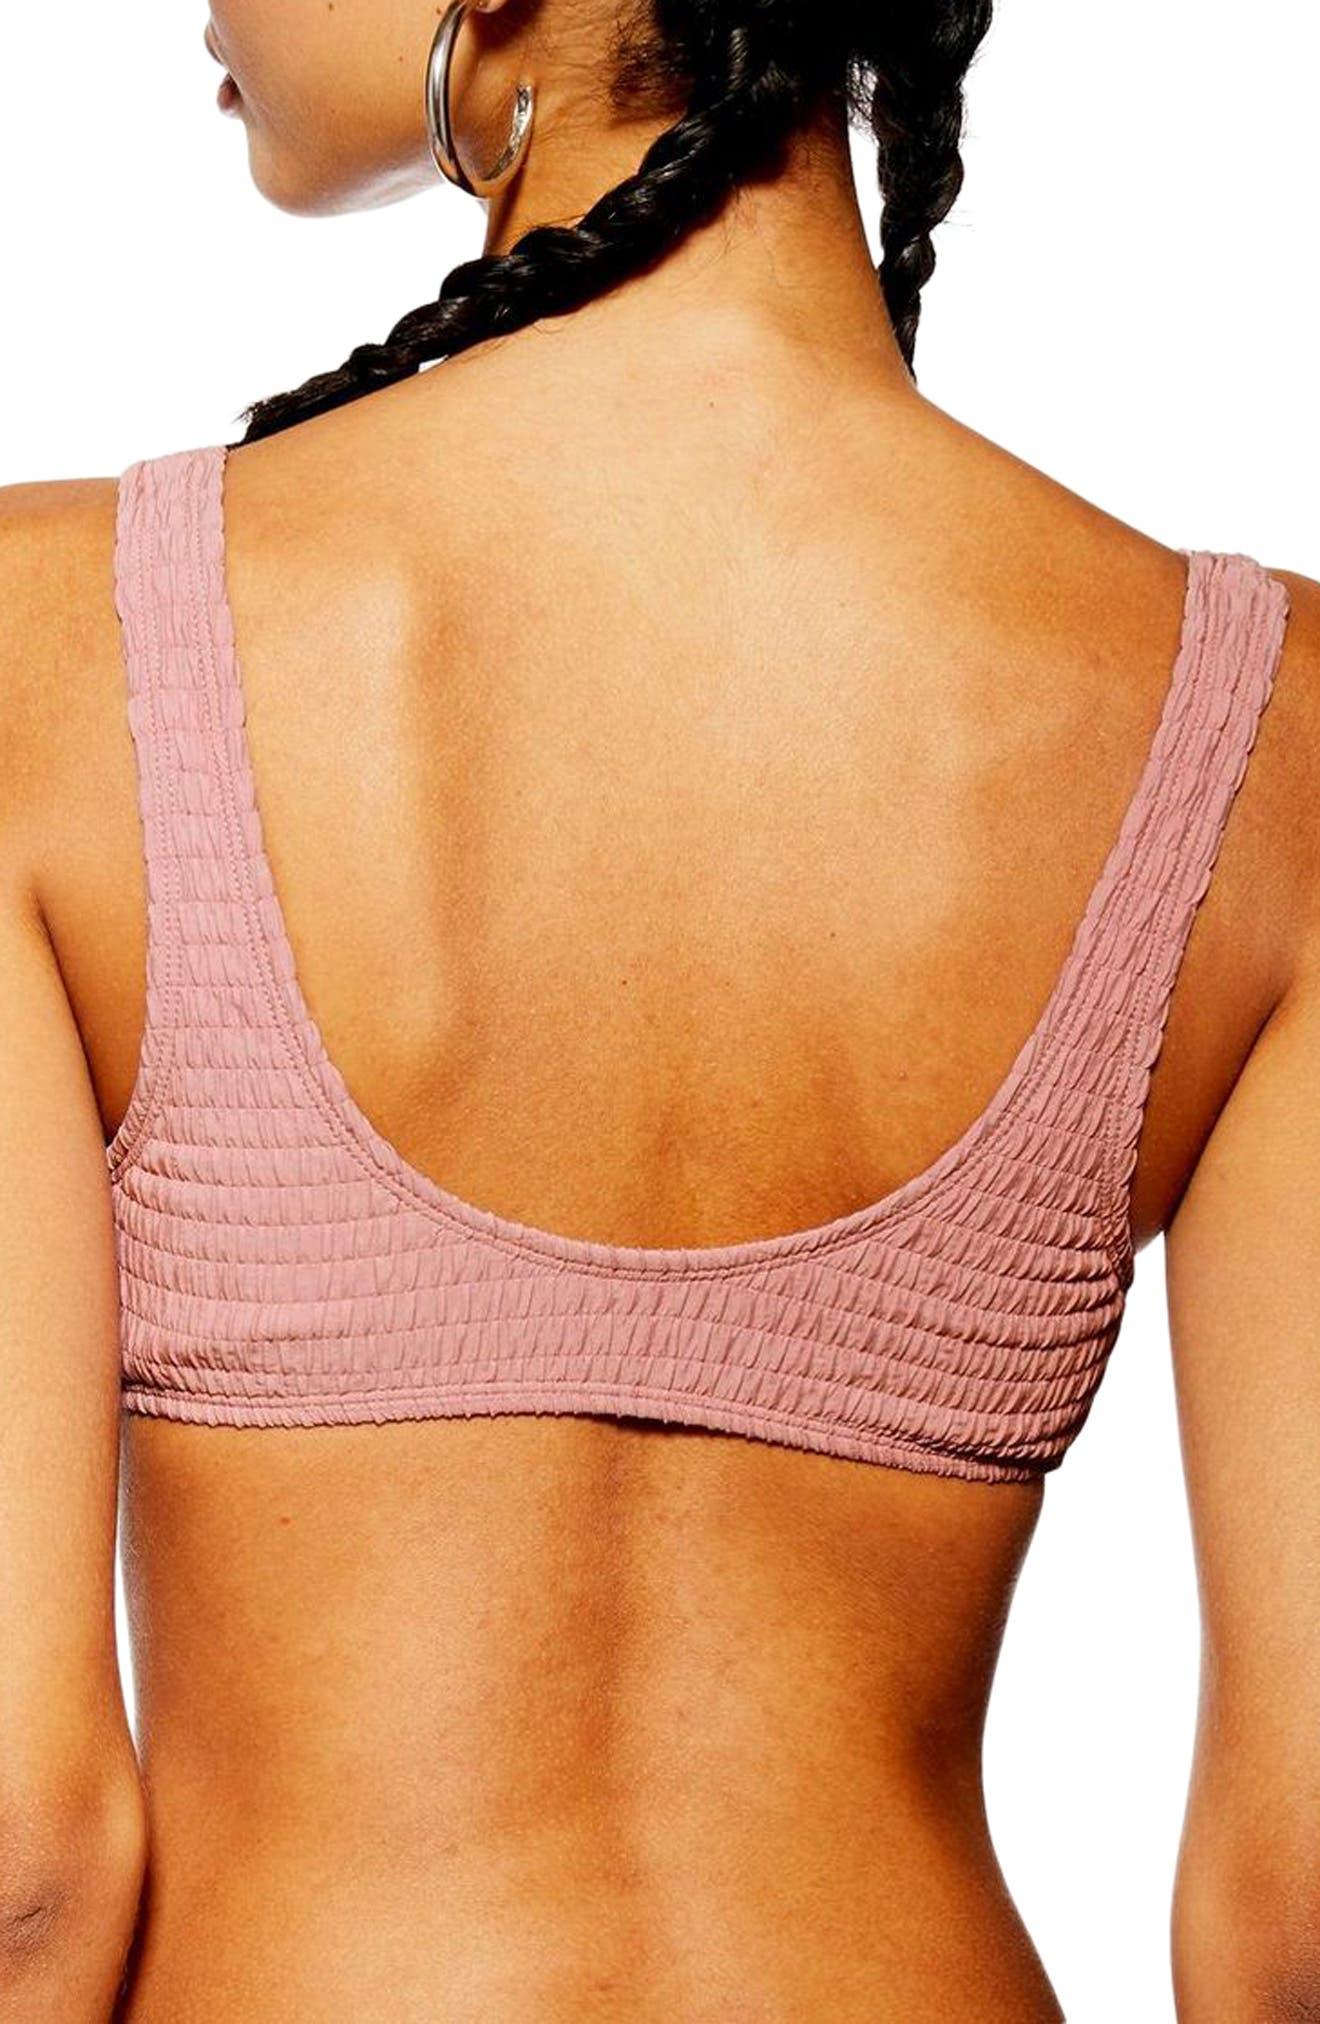 TOPSHOP, Tortoiseshell Ring Smocked Bikini Top, Alternate thumbnail 2, color, DUSTY PINK